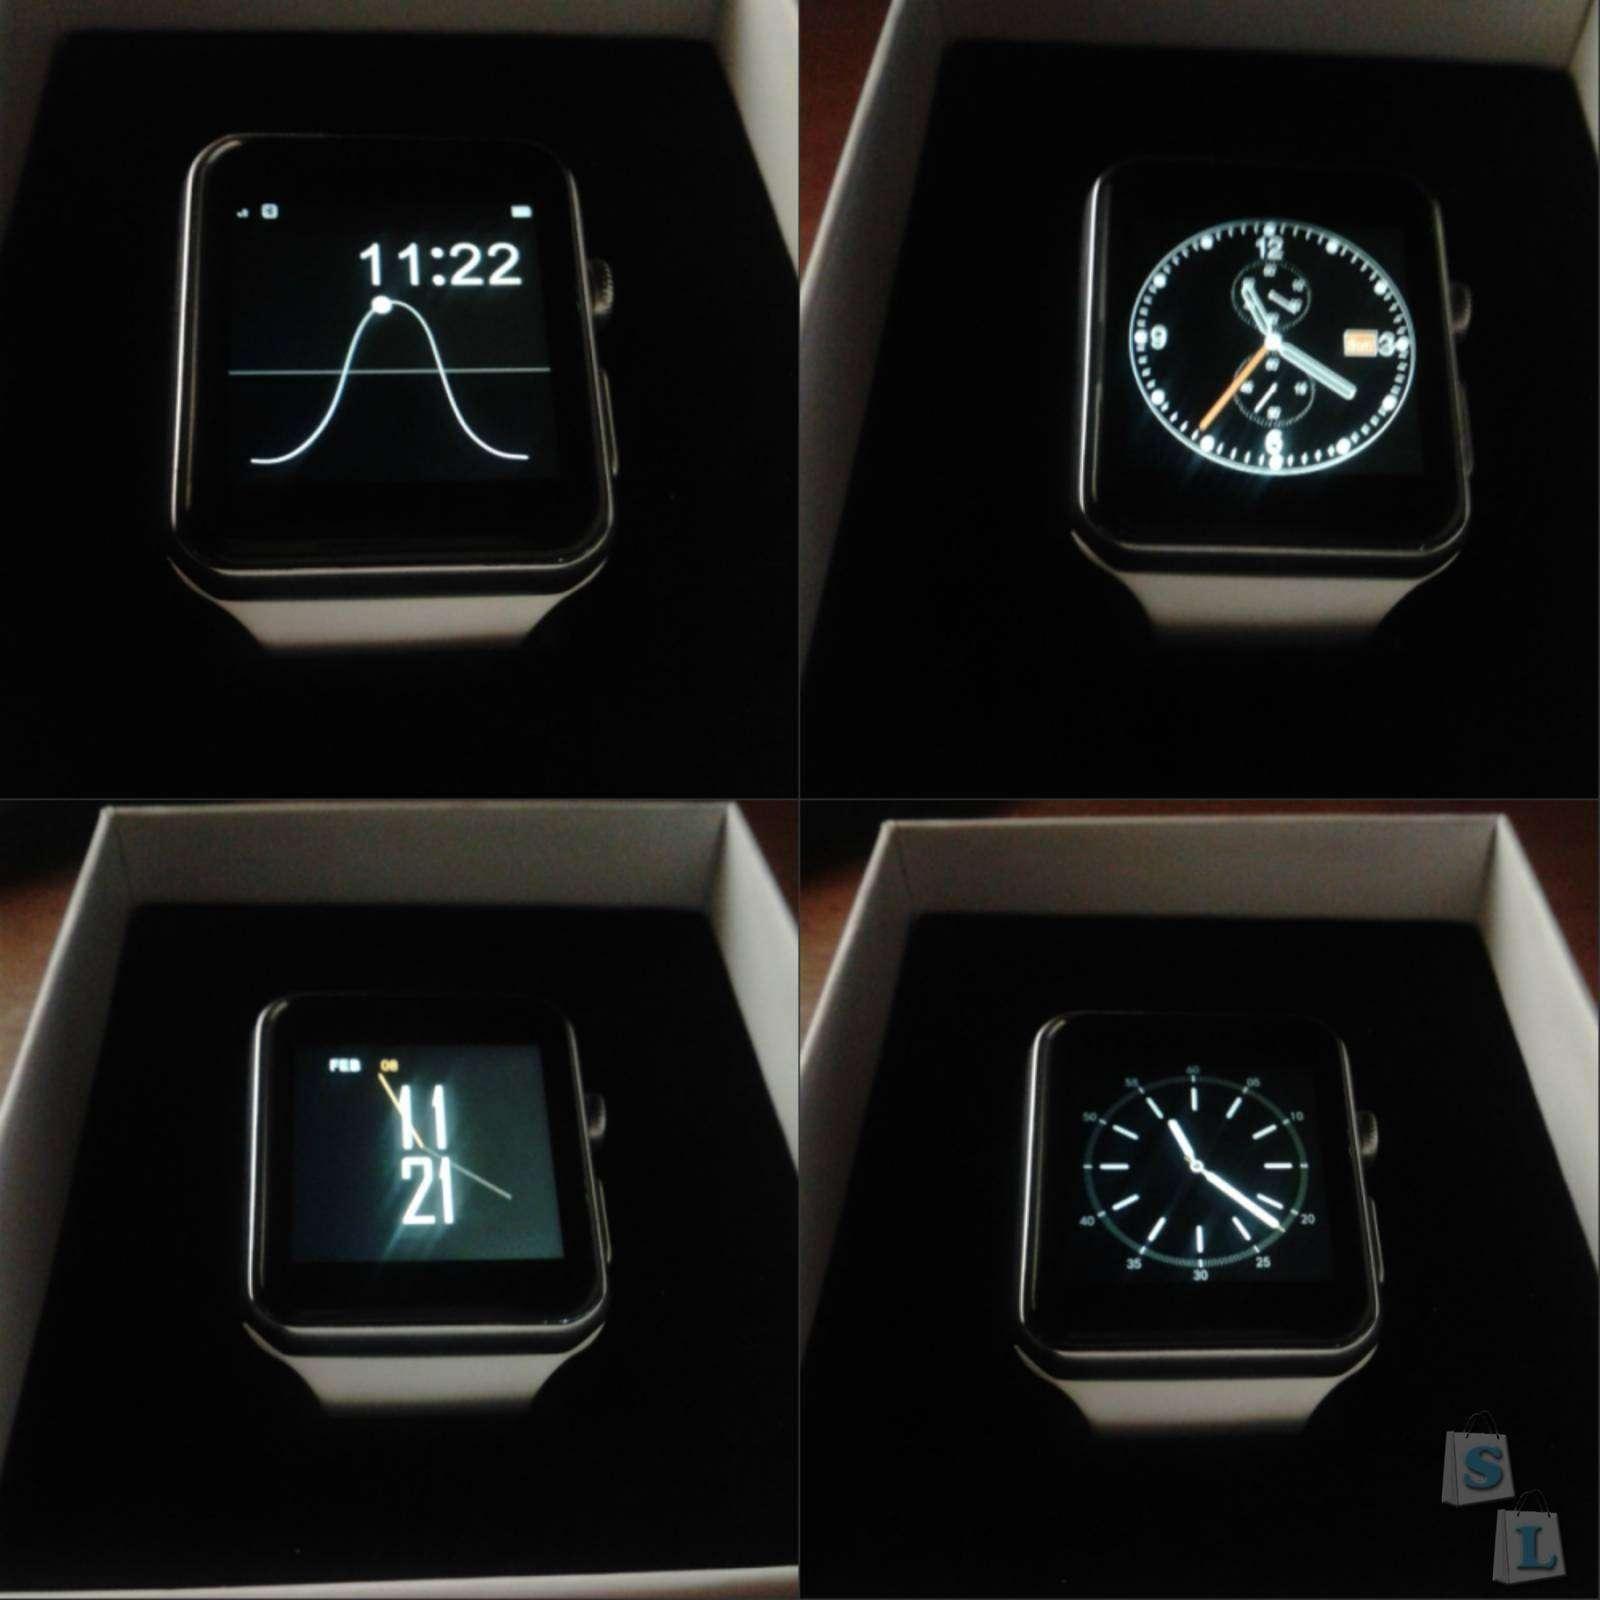 GearBest: ORDRO SW25 неплохие телефон-часы